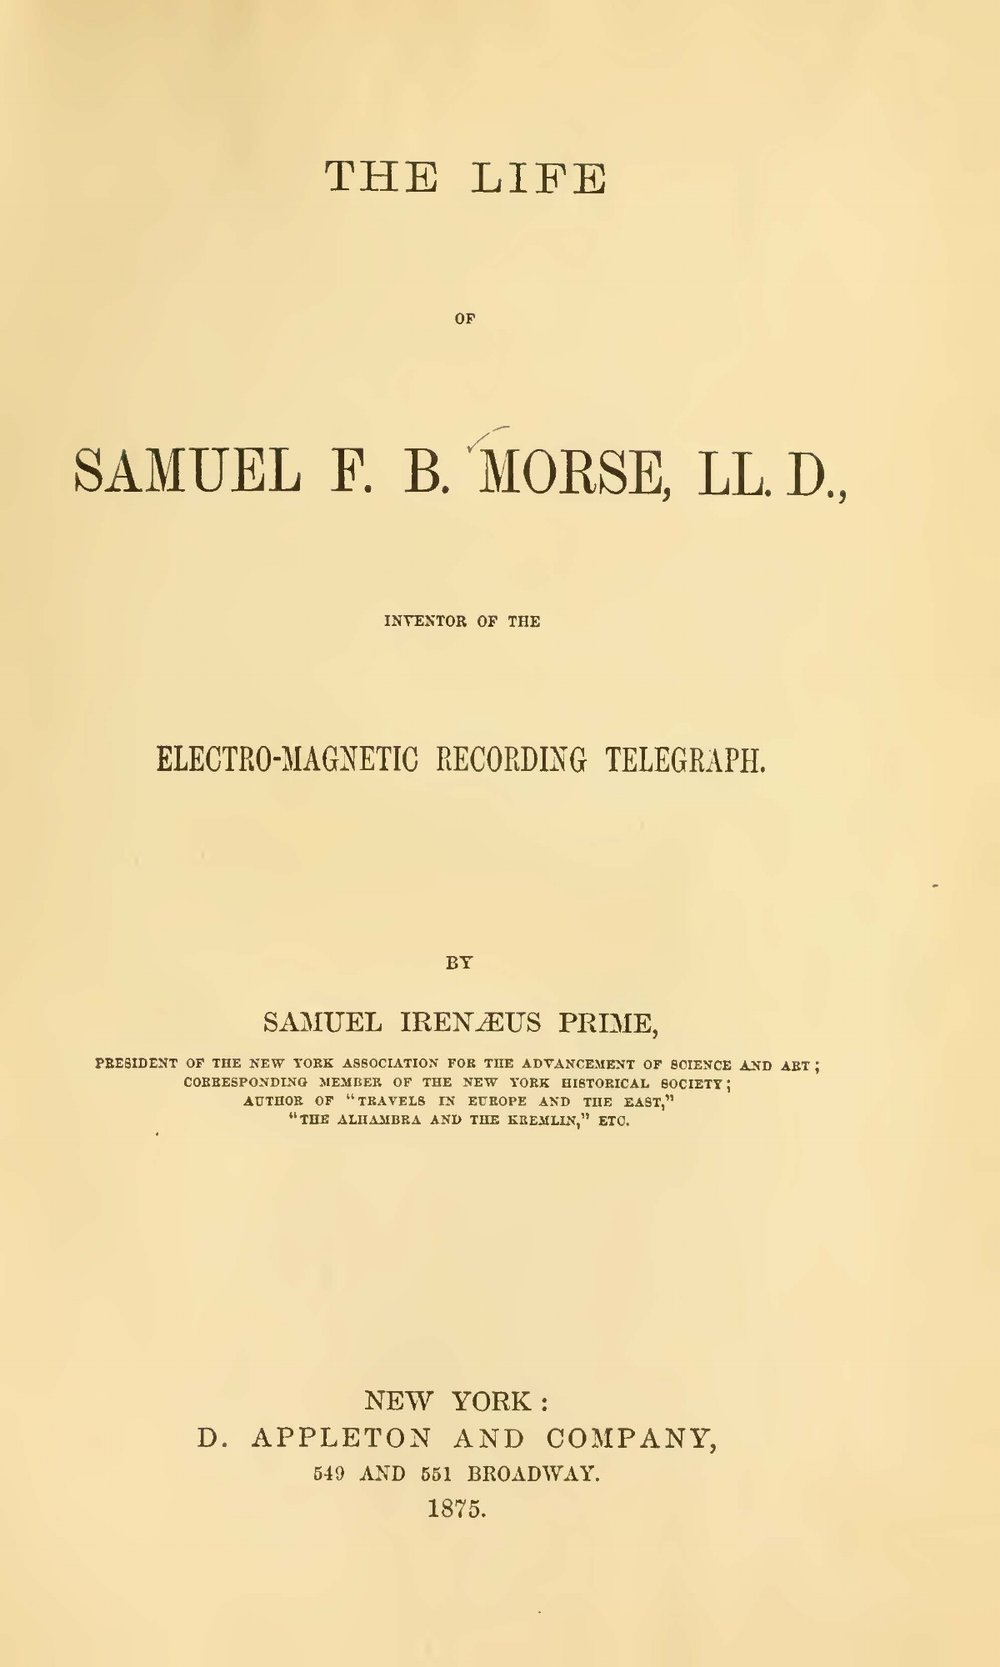 Prime, Samuel Irenaeus, Life of Samuel F.B. Morse Title Page.jpg